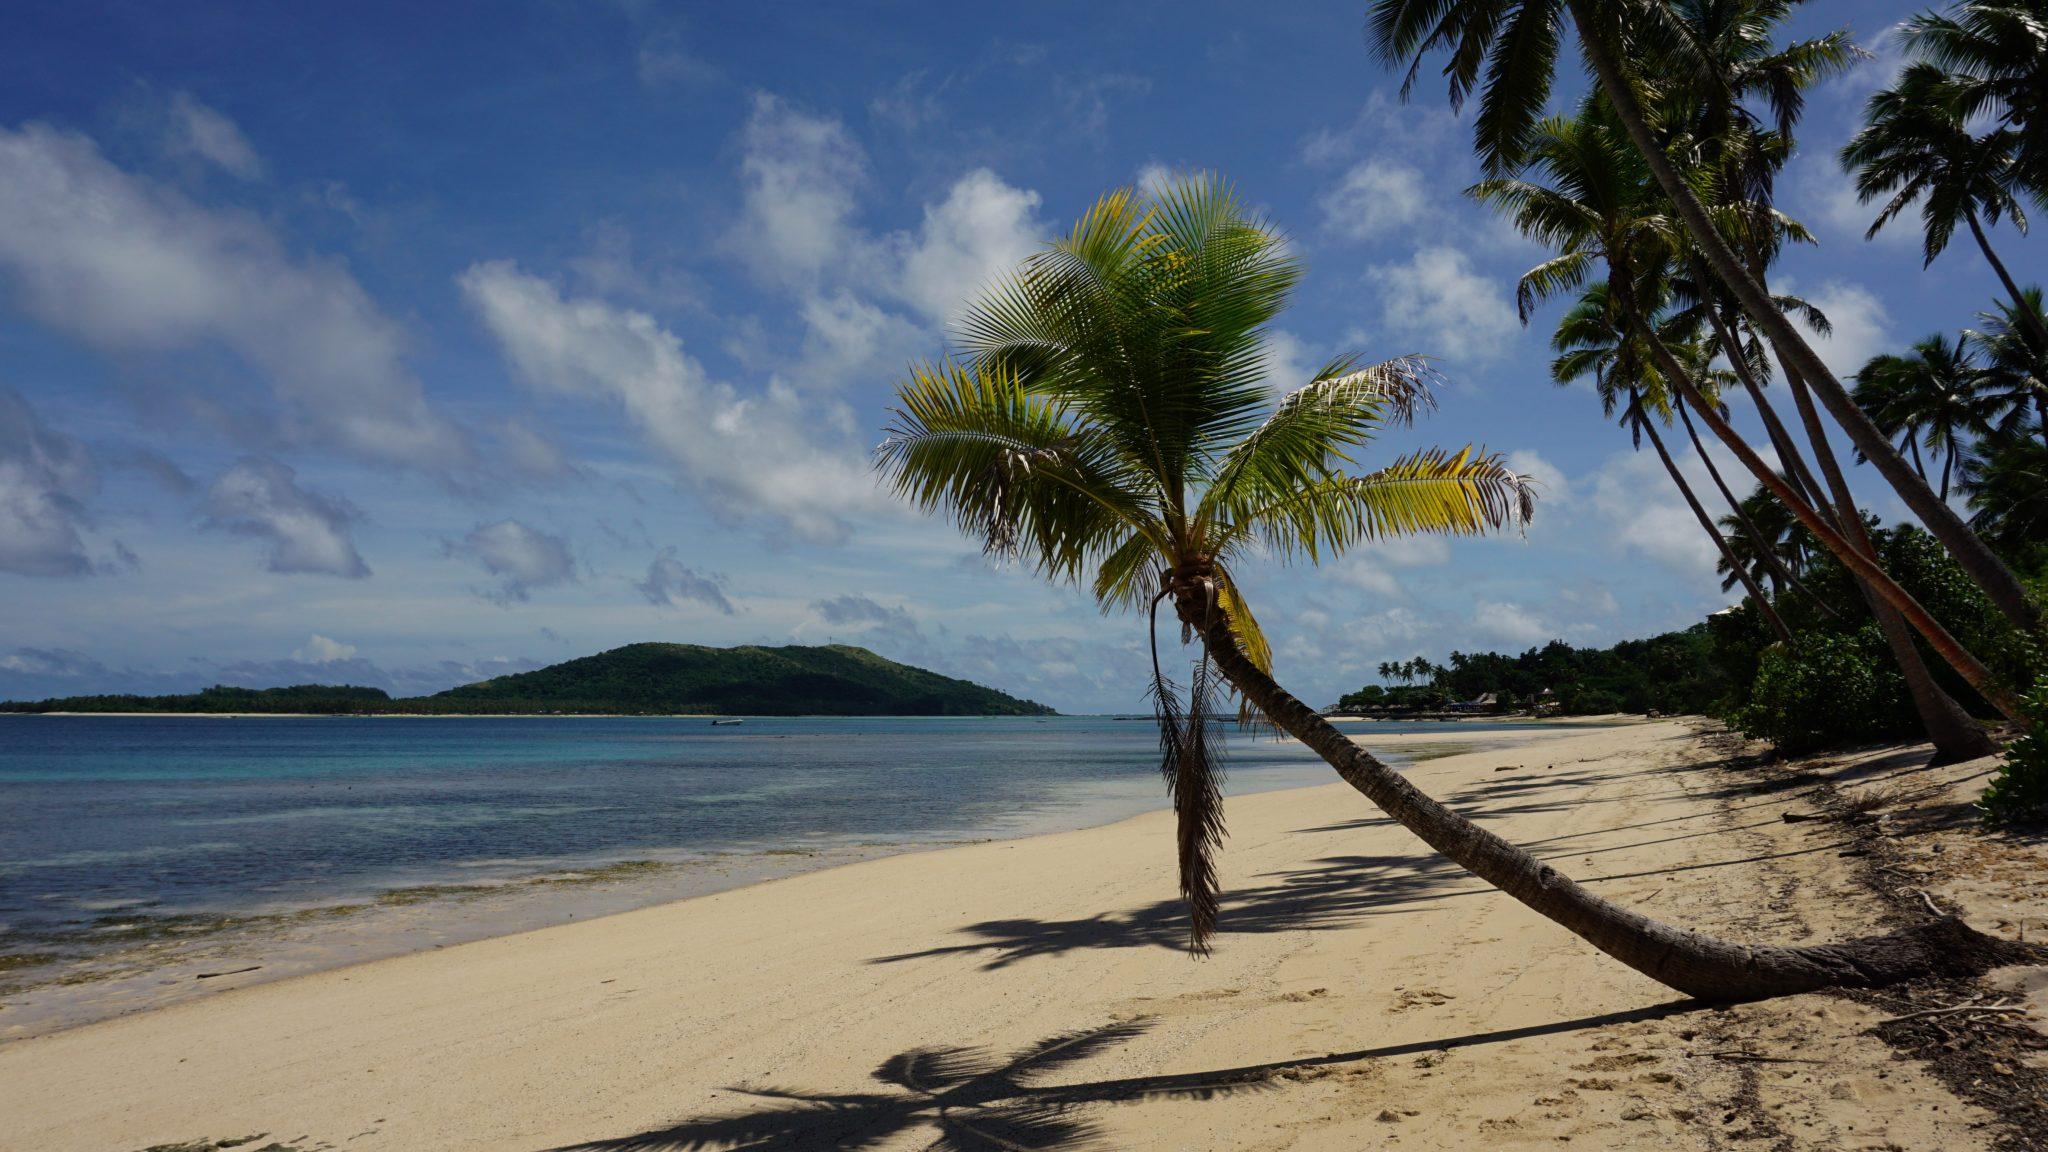 Fidschi: Palme am Traumstrand